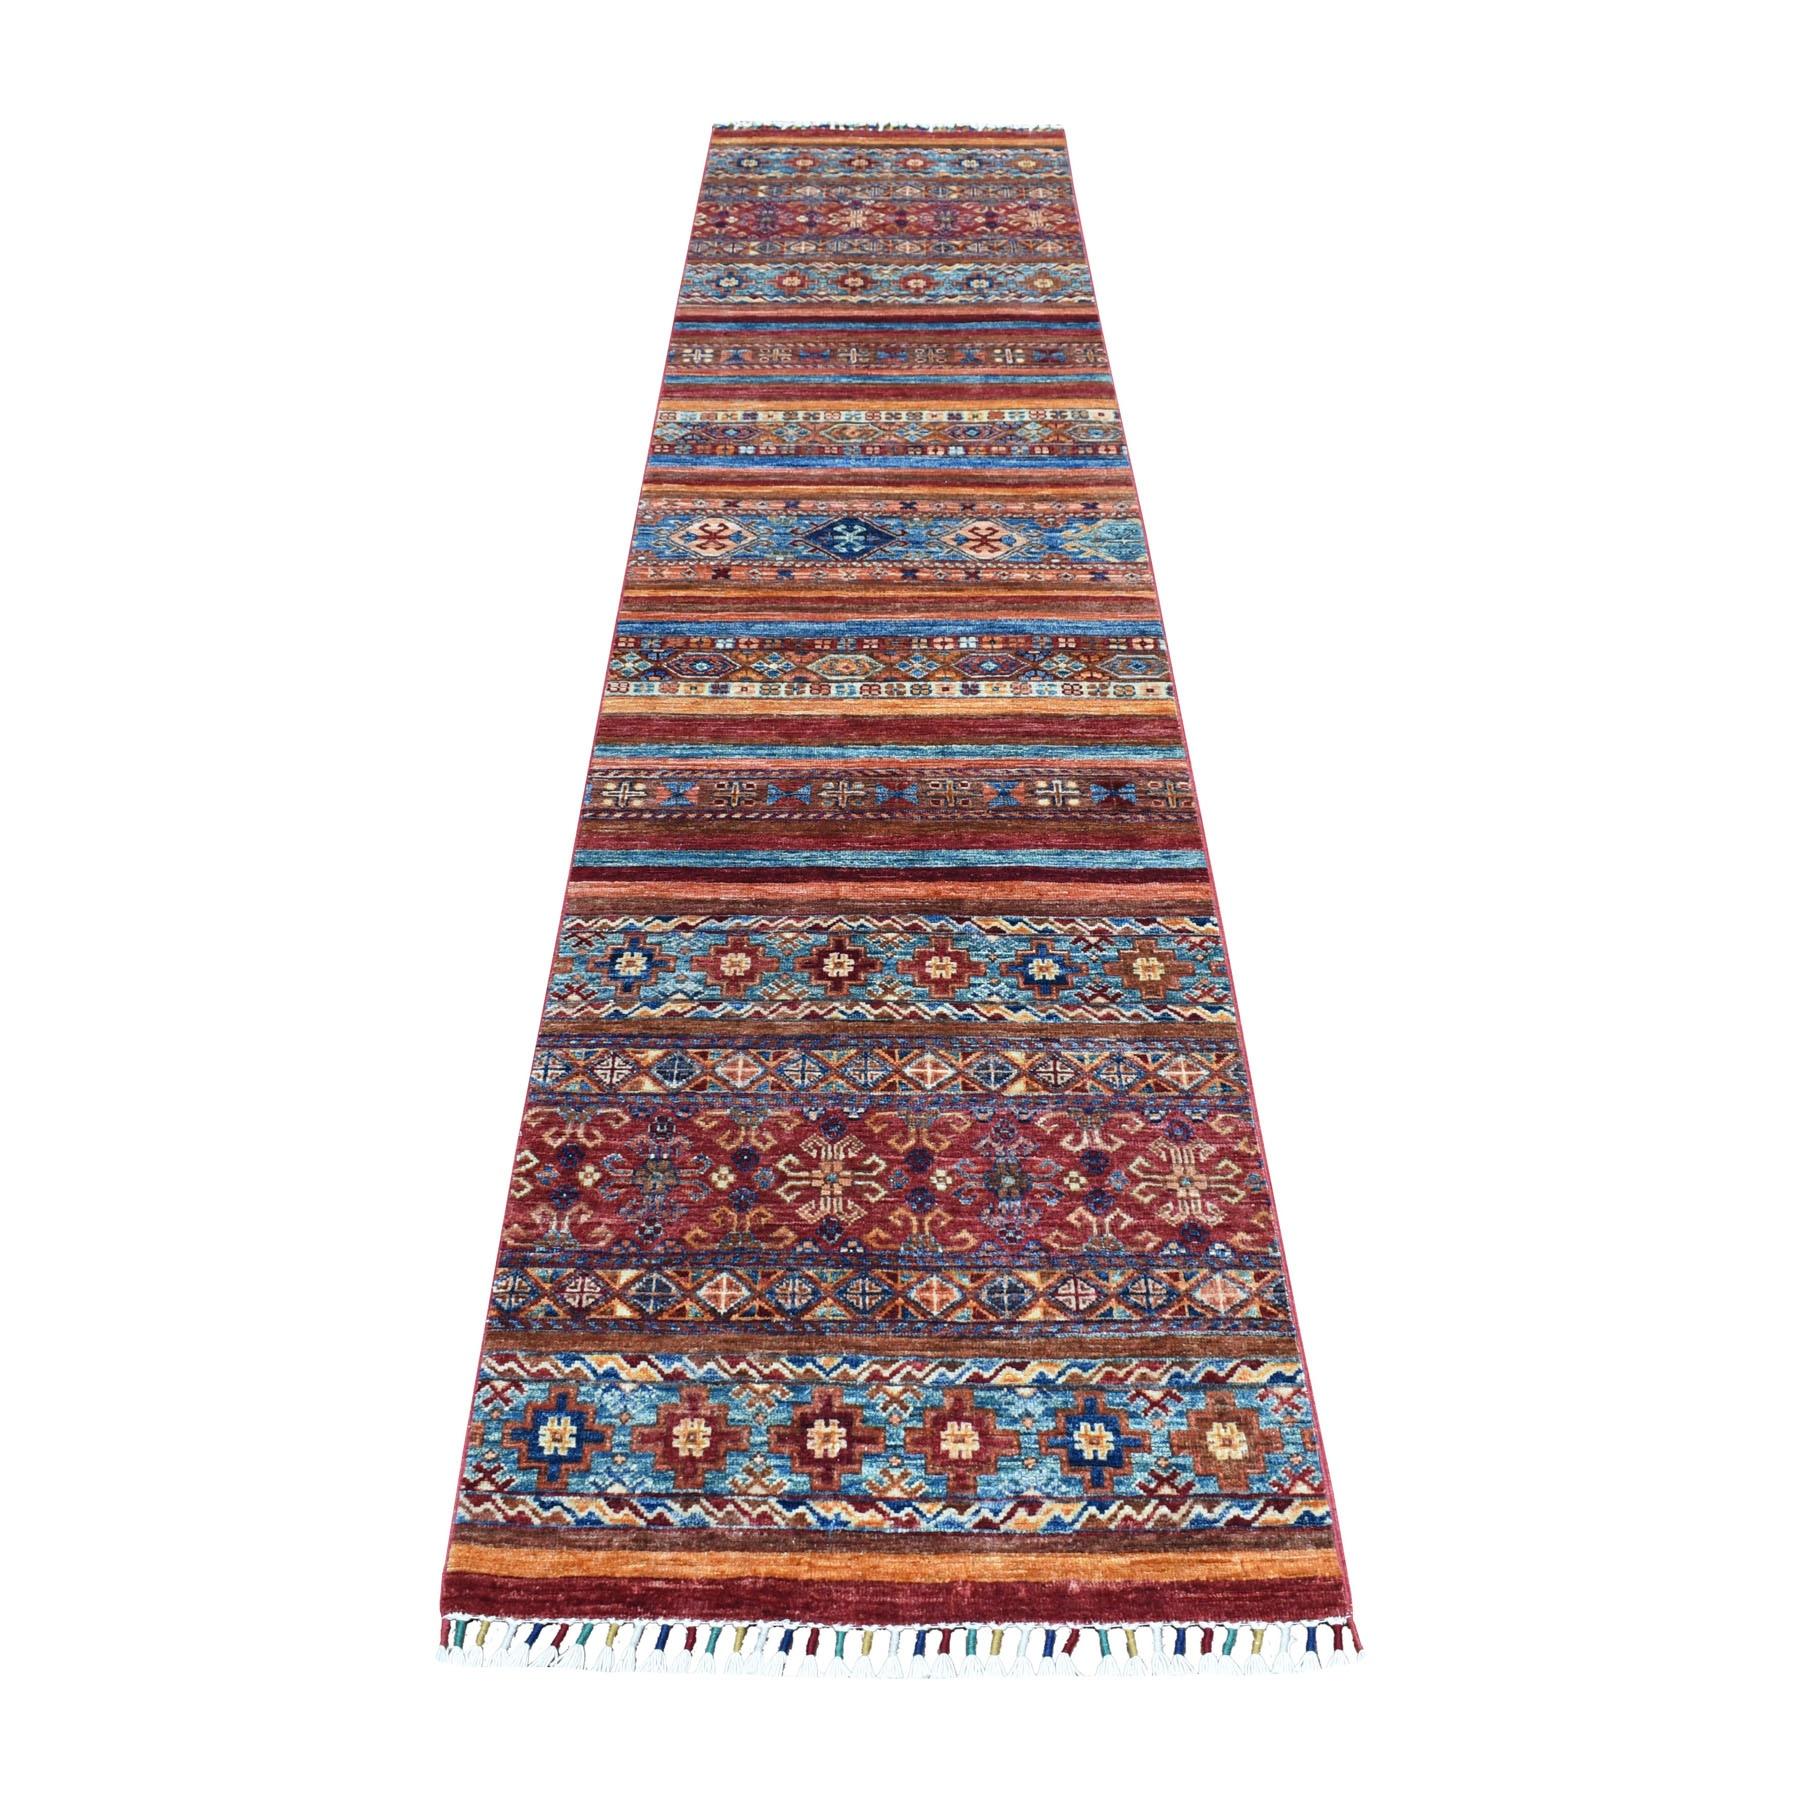 "2'4""x10'3"" Khorjin Design Colorful Runner Super Kazak Pure Wool Hand Knotted Oriental Rug"